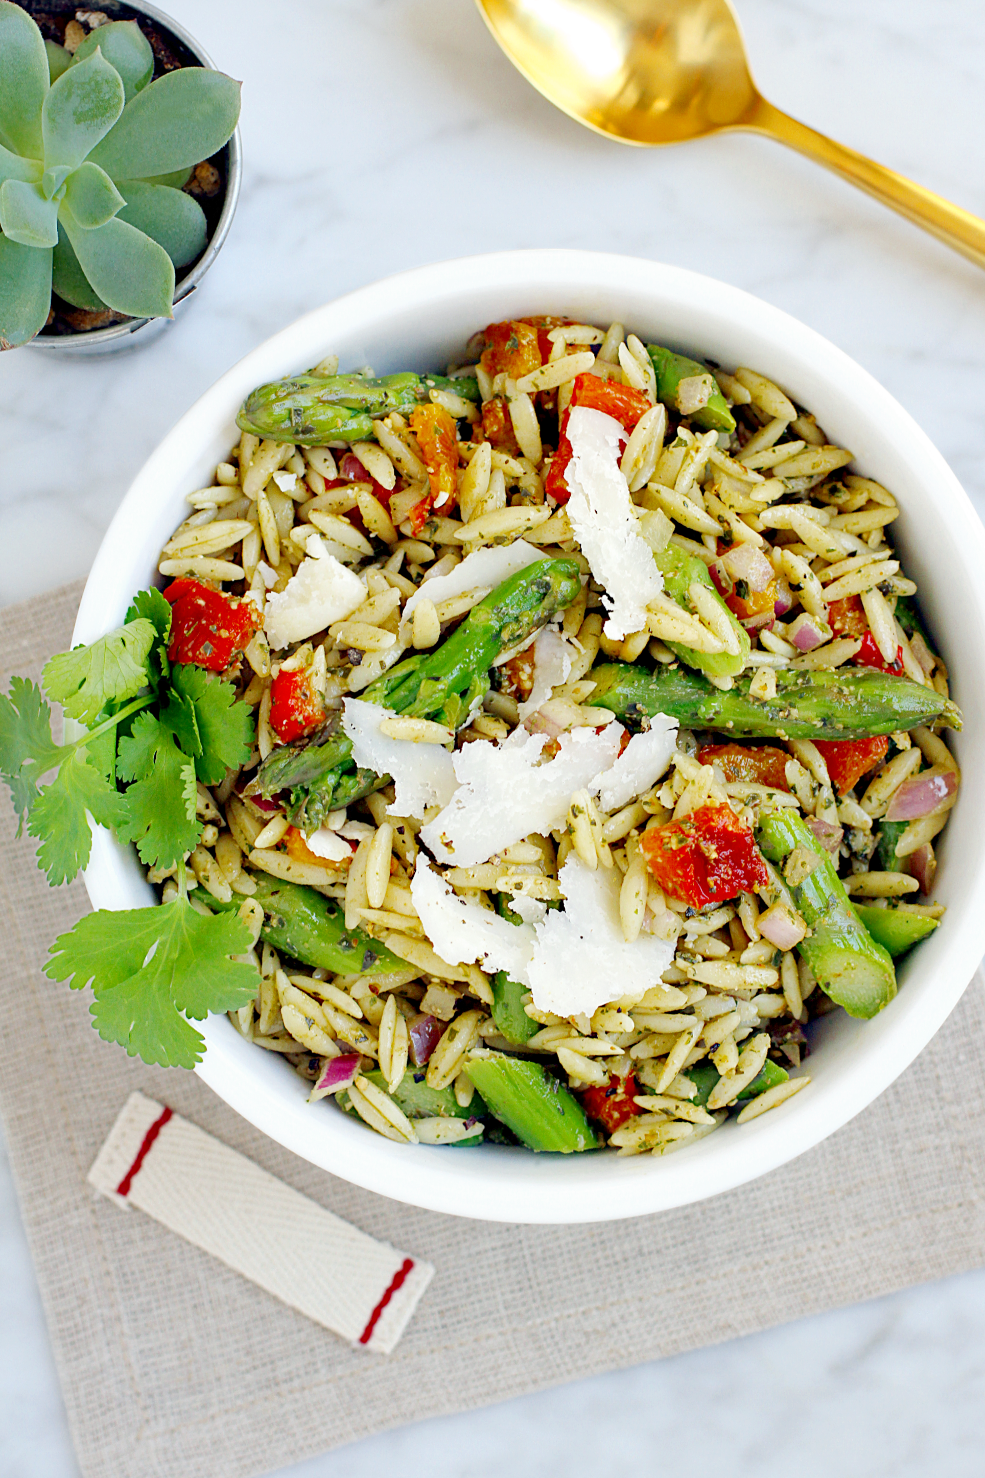 Image of orzo pasta salad with basil pesto.